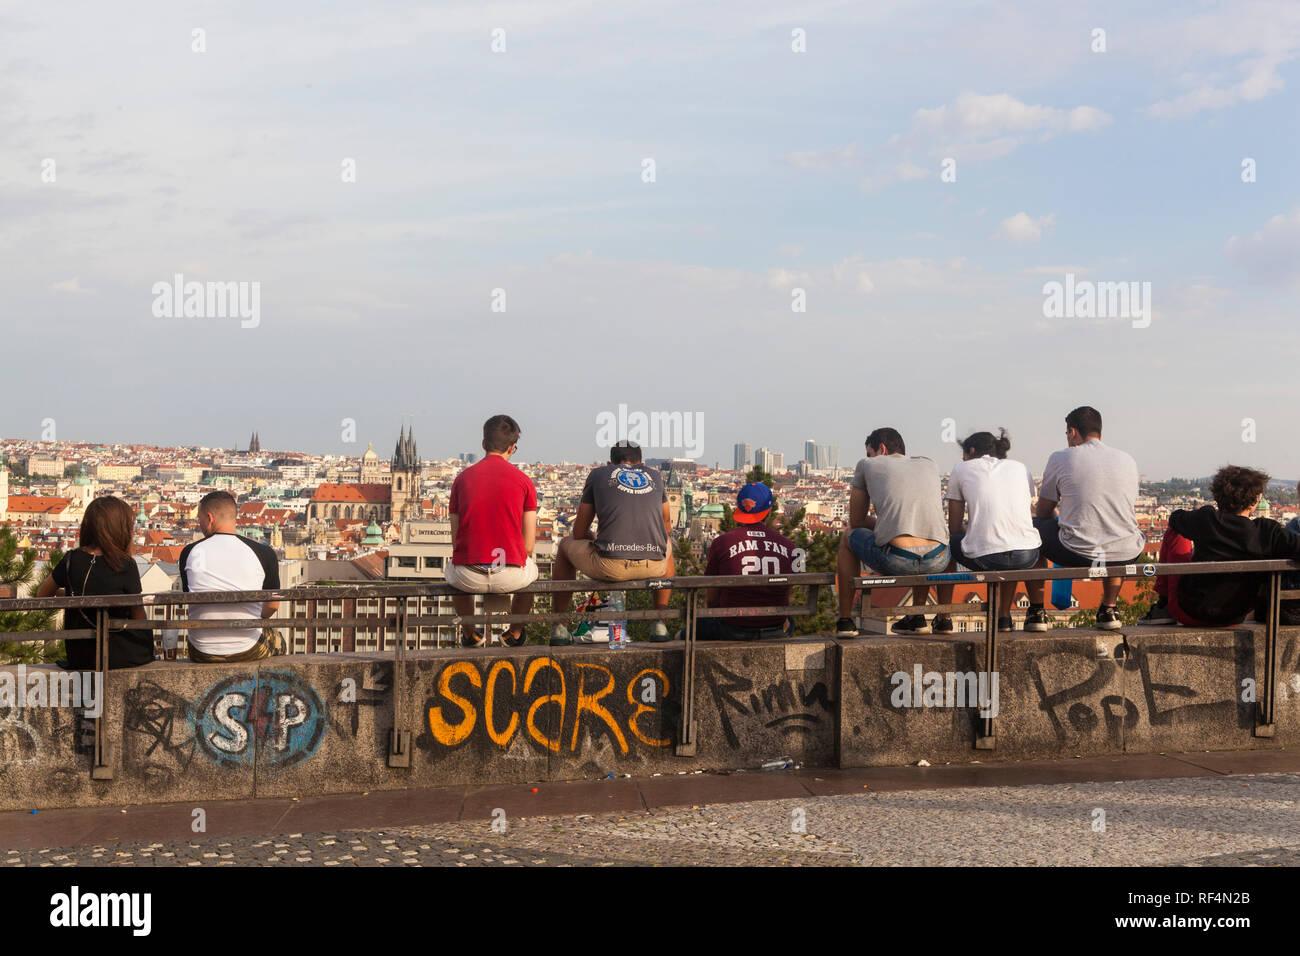 Prague, Czech Republic - July 17 2018: People sitting on a fence in Letna Park Stock Photo